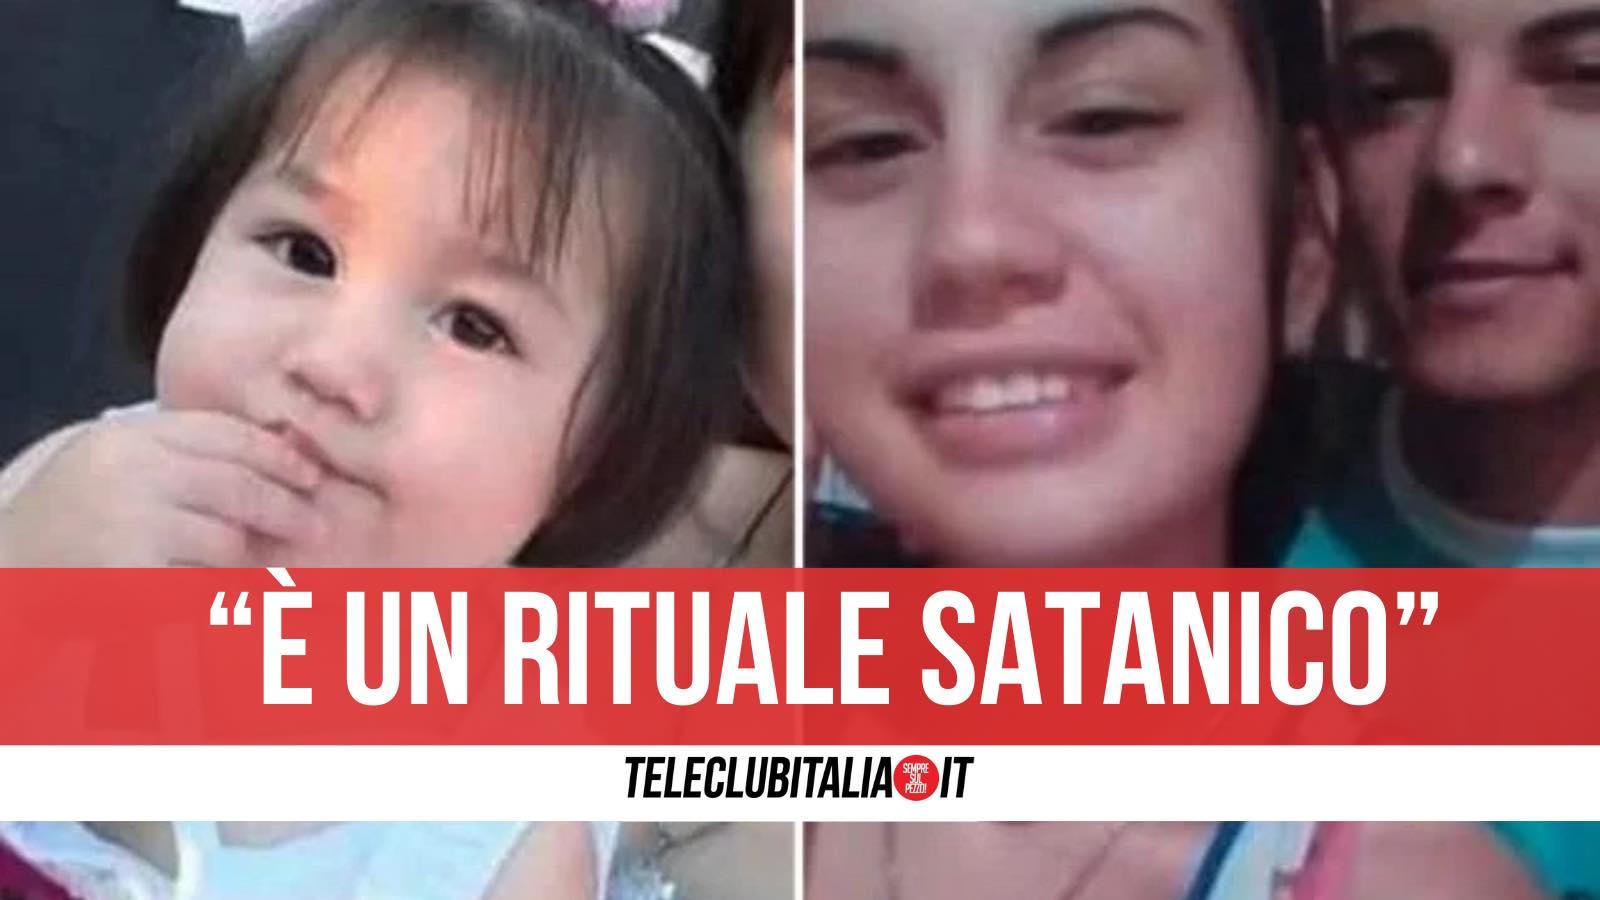 maia uccisa argentina bimba rituale satanico